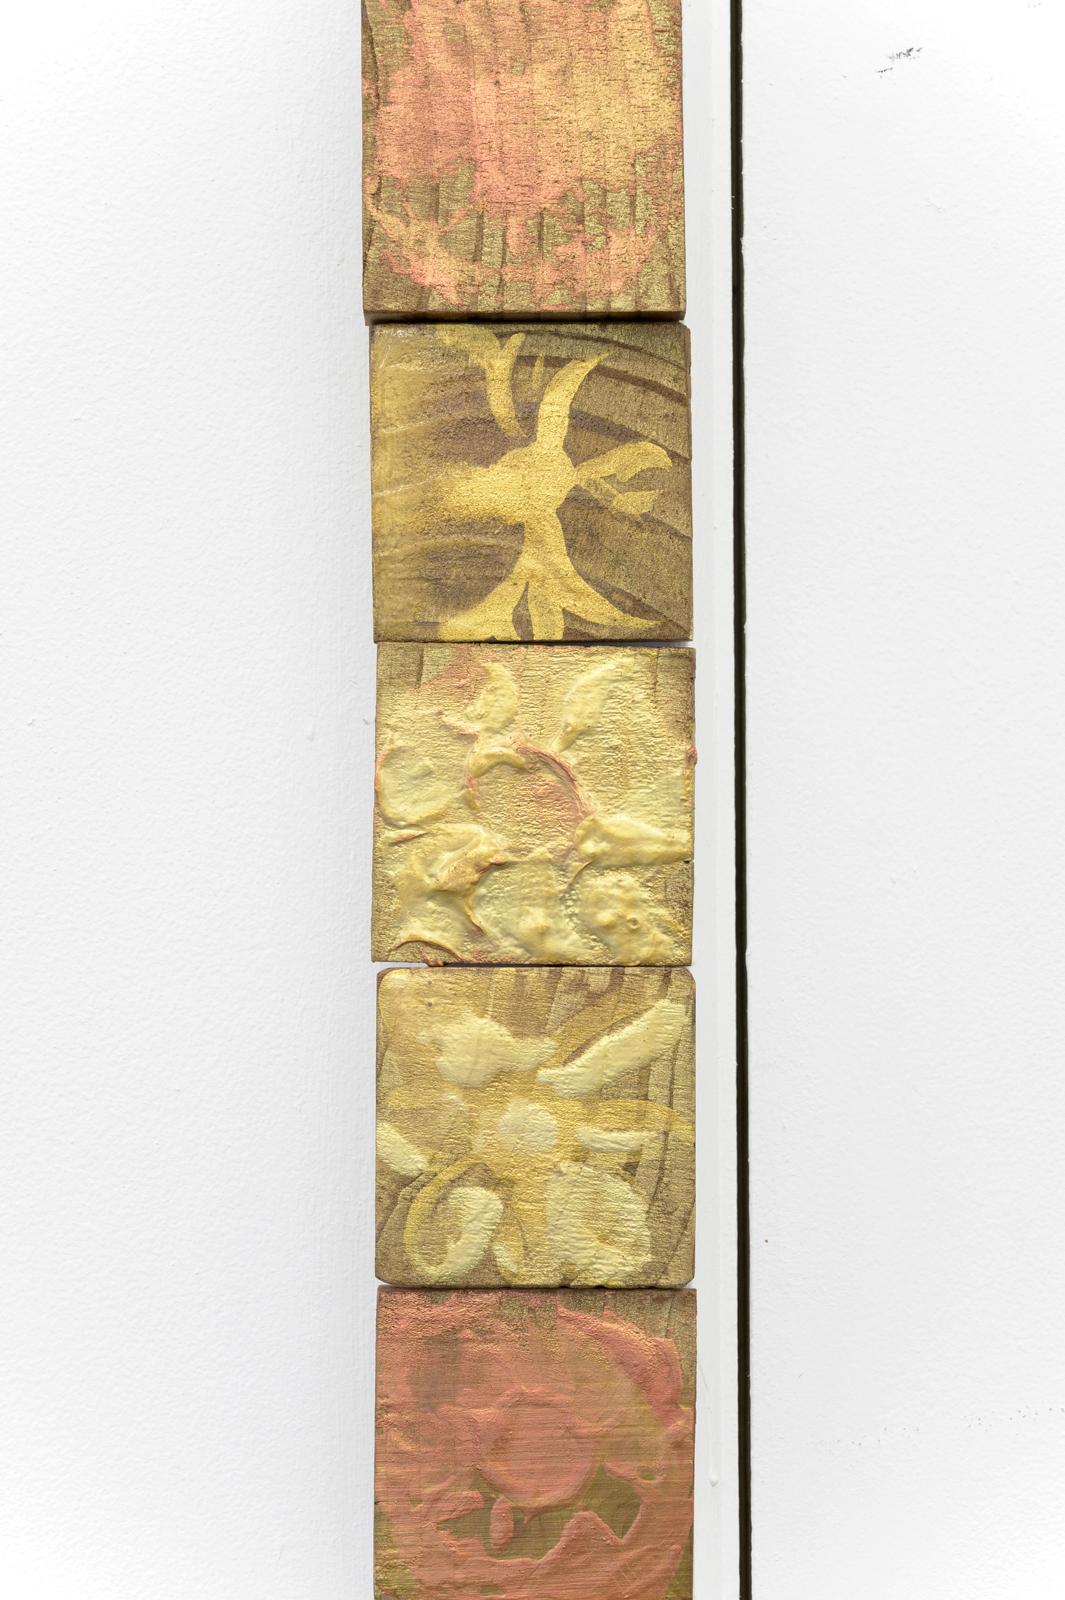 James Murnane,  St Joseph's Gate  (detail), 2019.  Image: Aaron Christopher Rees